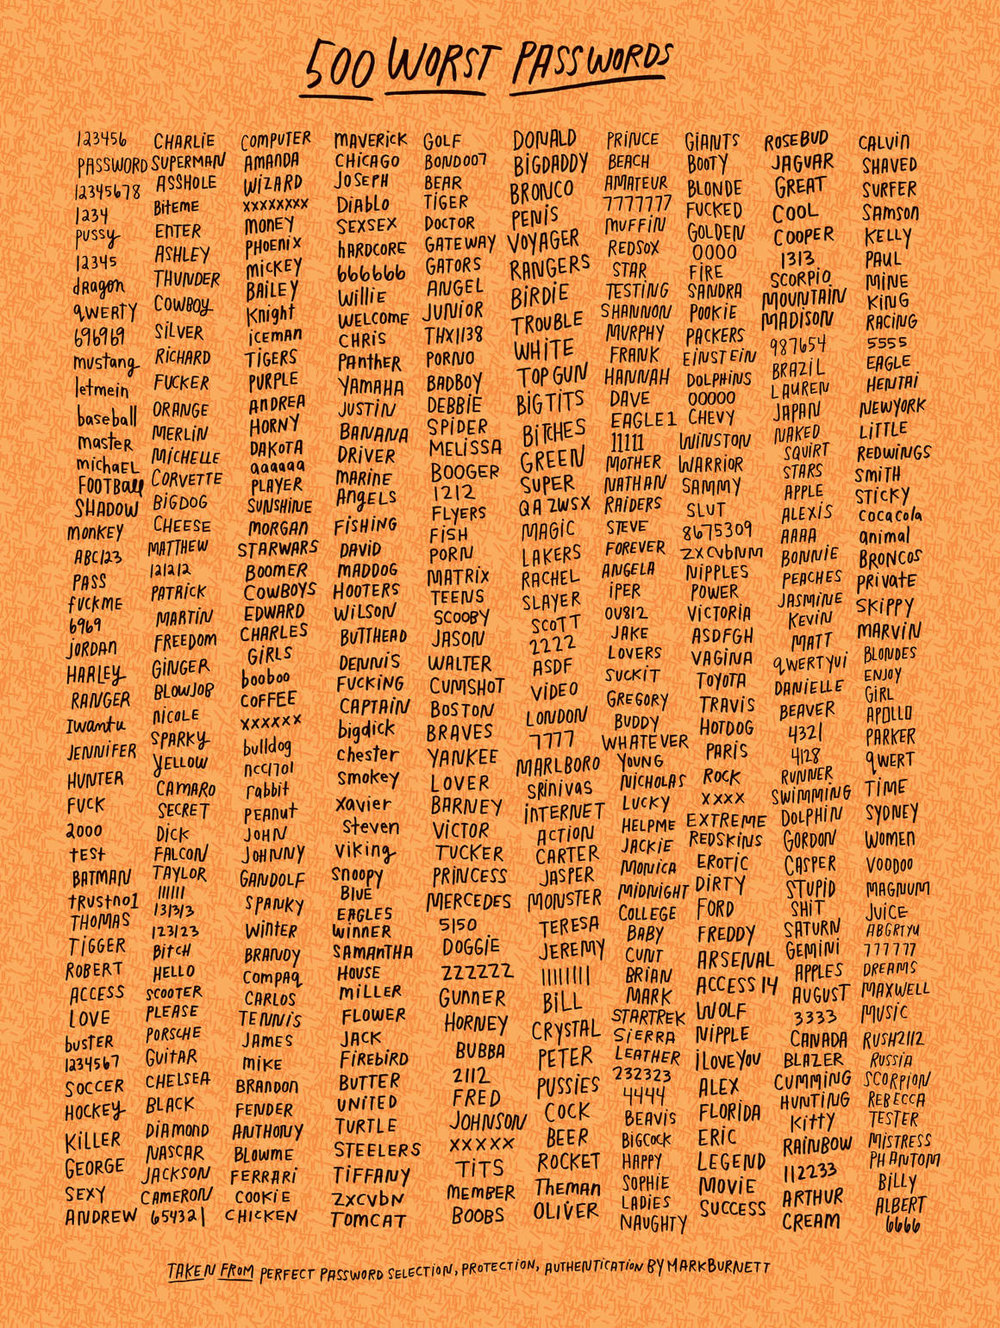 kate-bingaman-burt-500-worst-passwords-18x24-MAIN-563a4c99bf1ed-1160.jpg